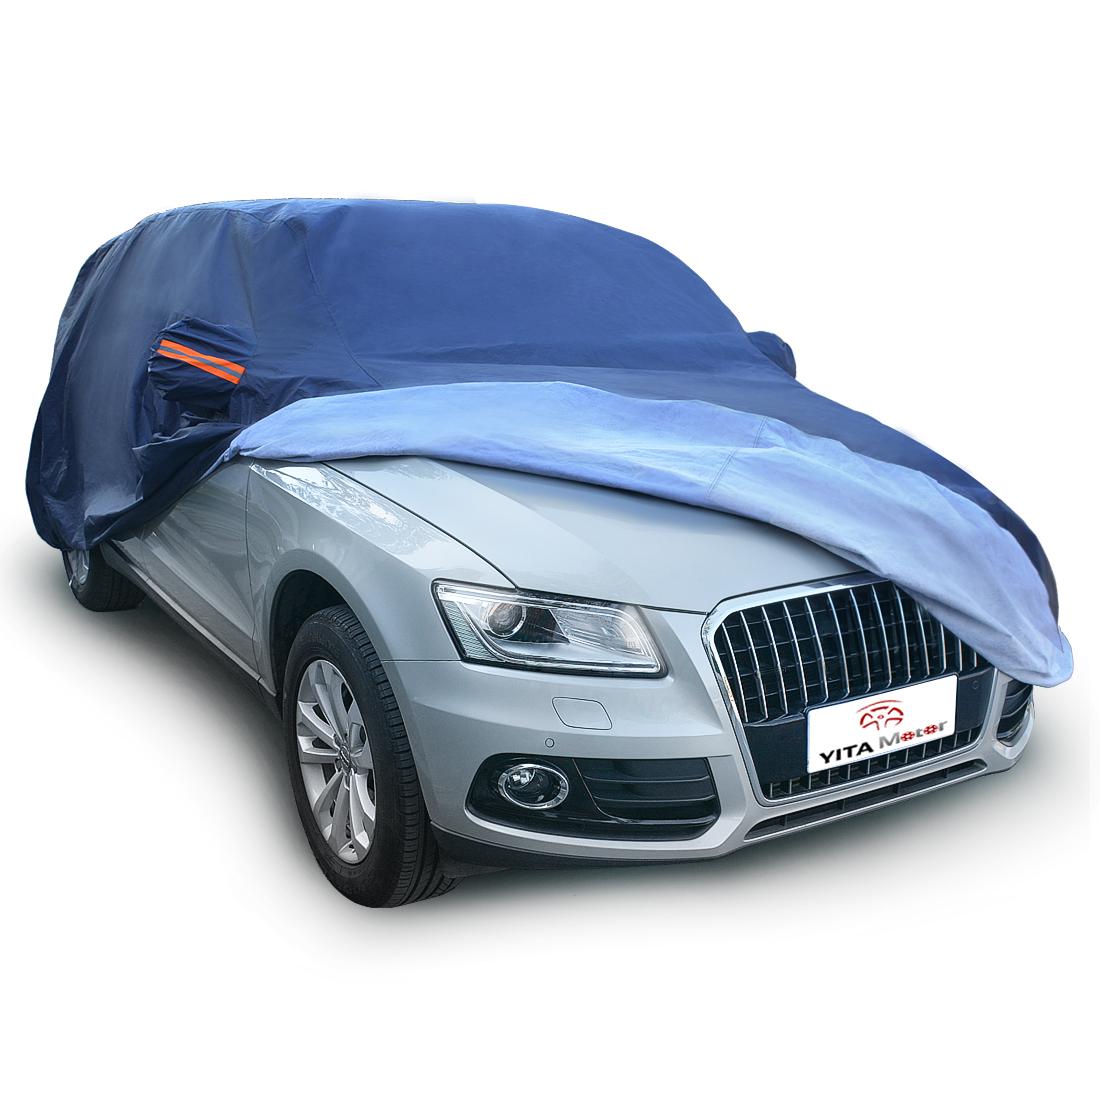 Waterproof Car Covers - Walmart com